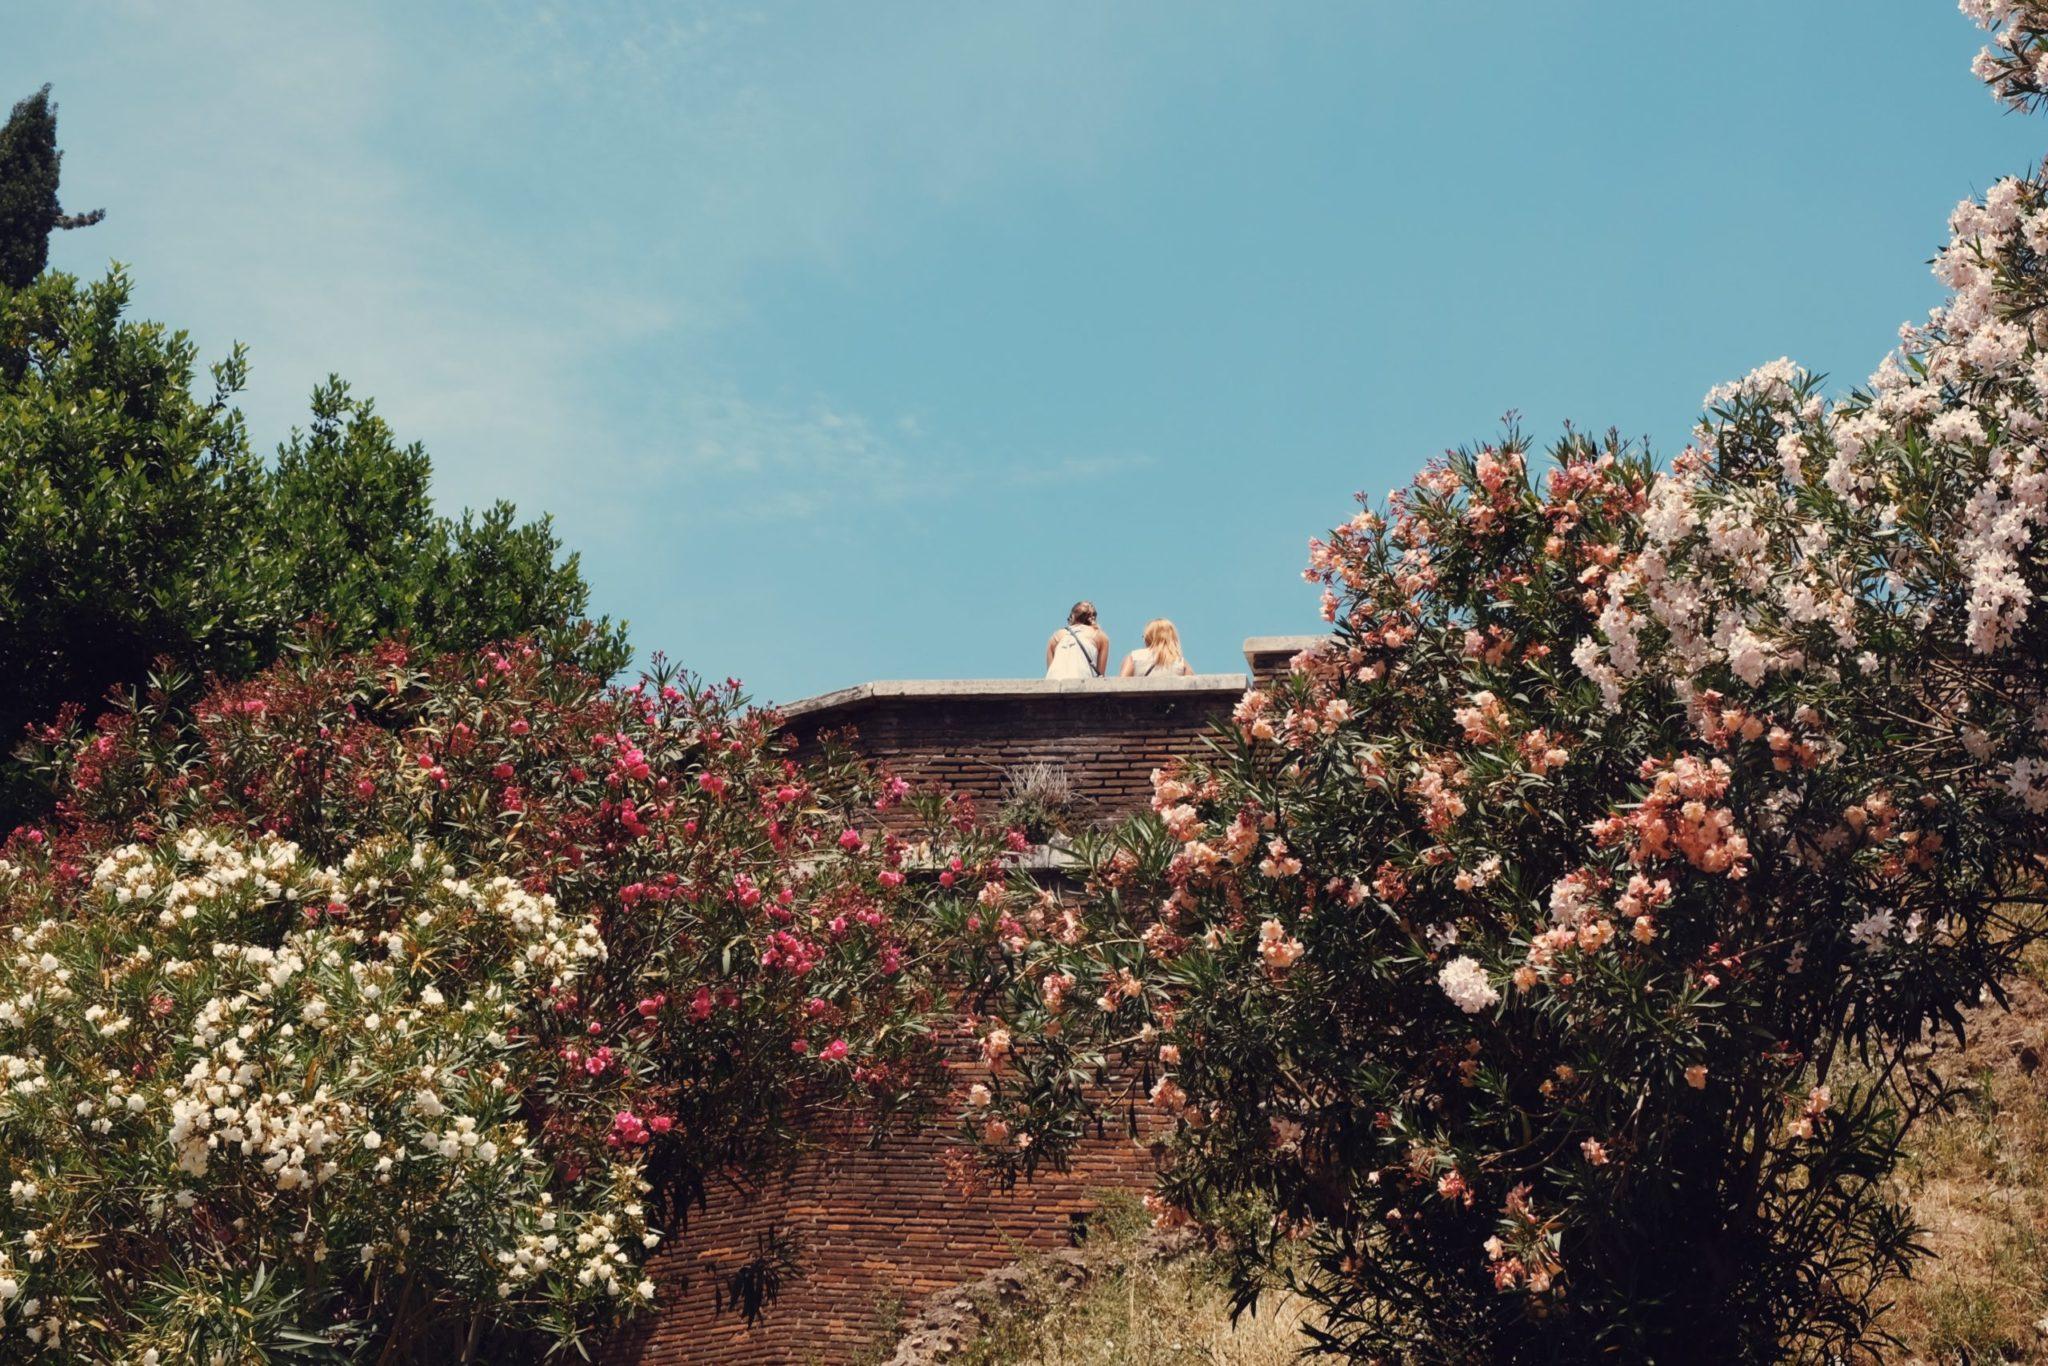 , TOP 10 OF THE MOST POPULAR GARDEN SHRUBS, Best Garden, Home And DIY Tips